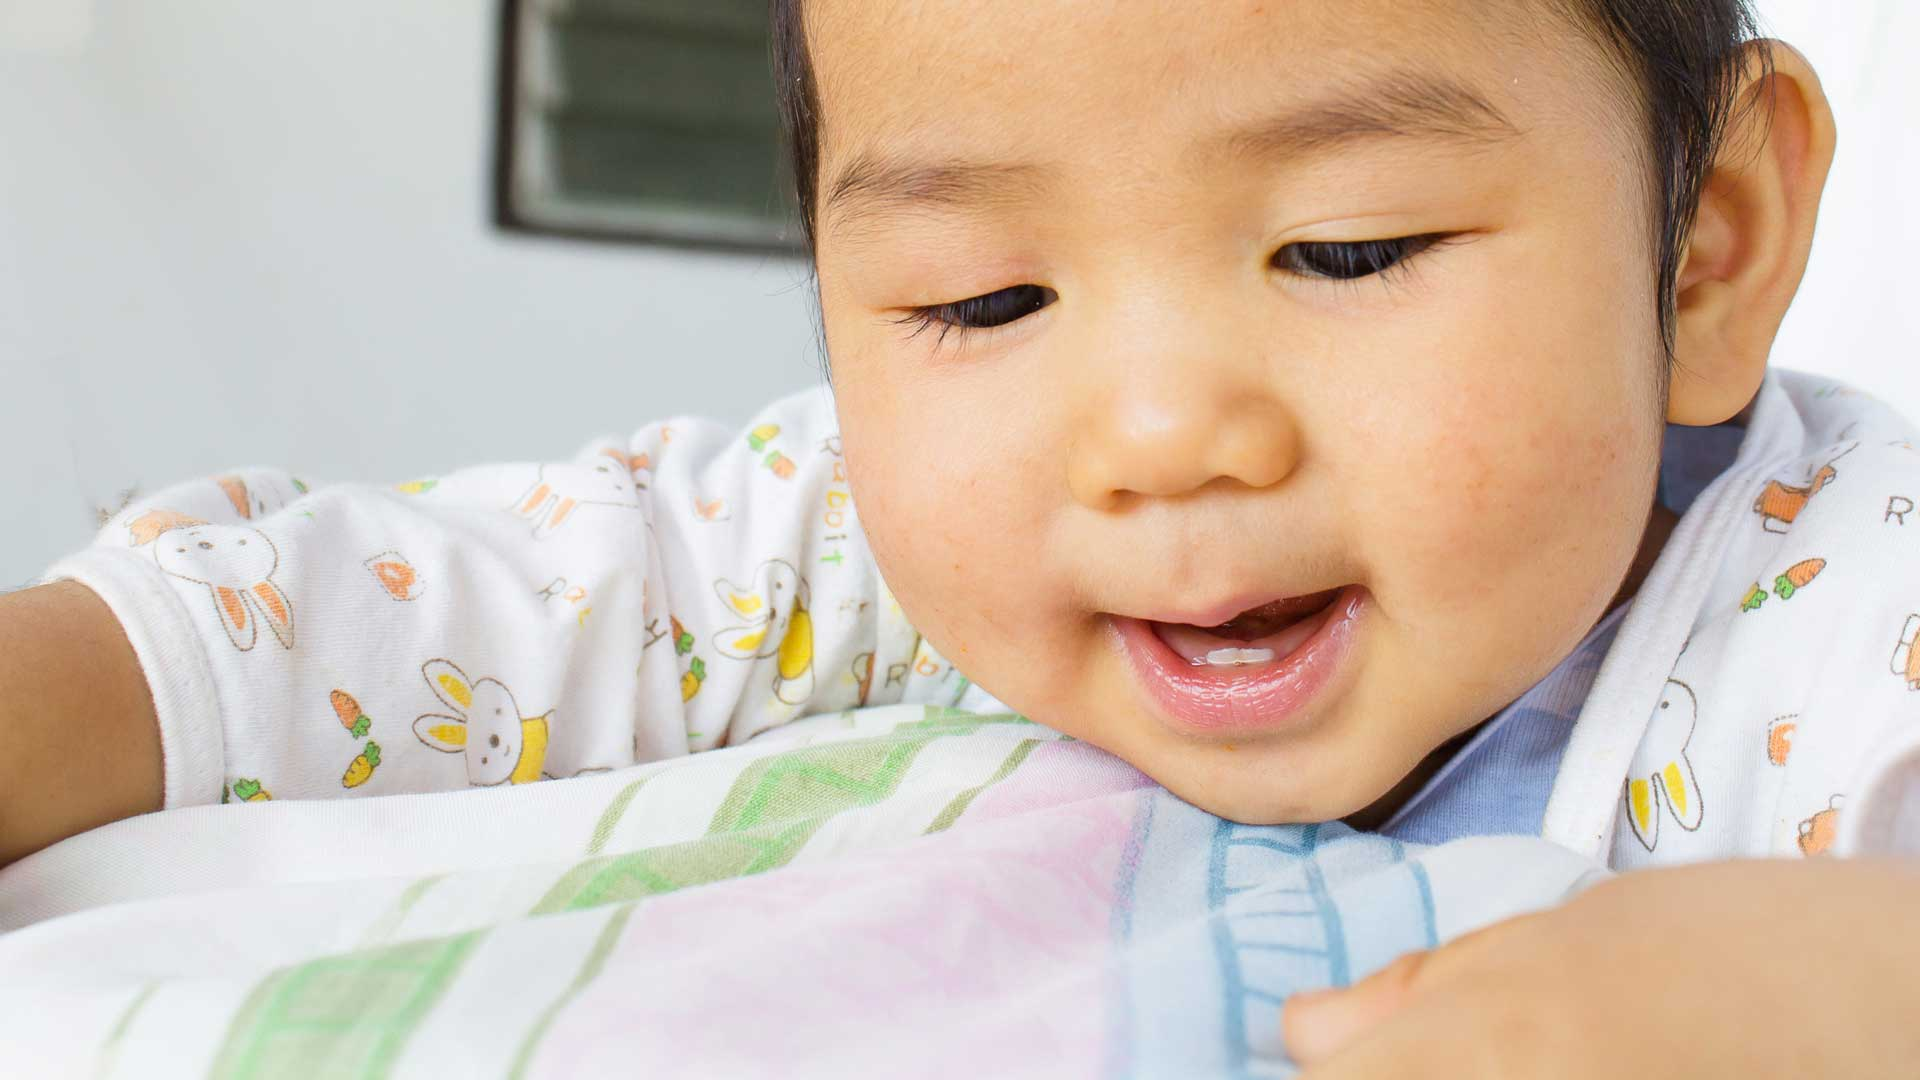 atopisk eksem i ansiktet hos baby